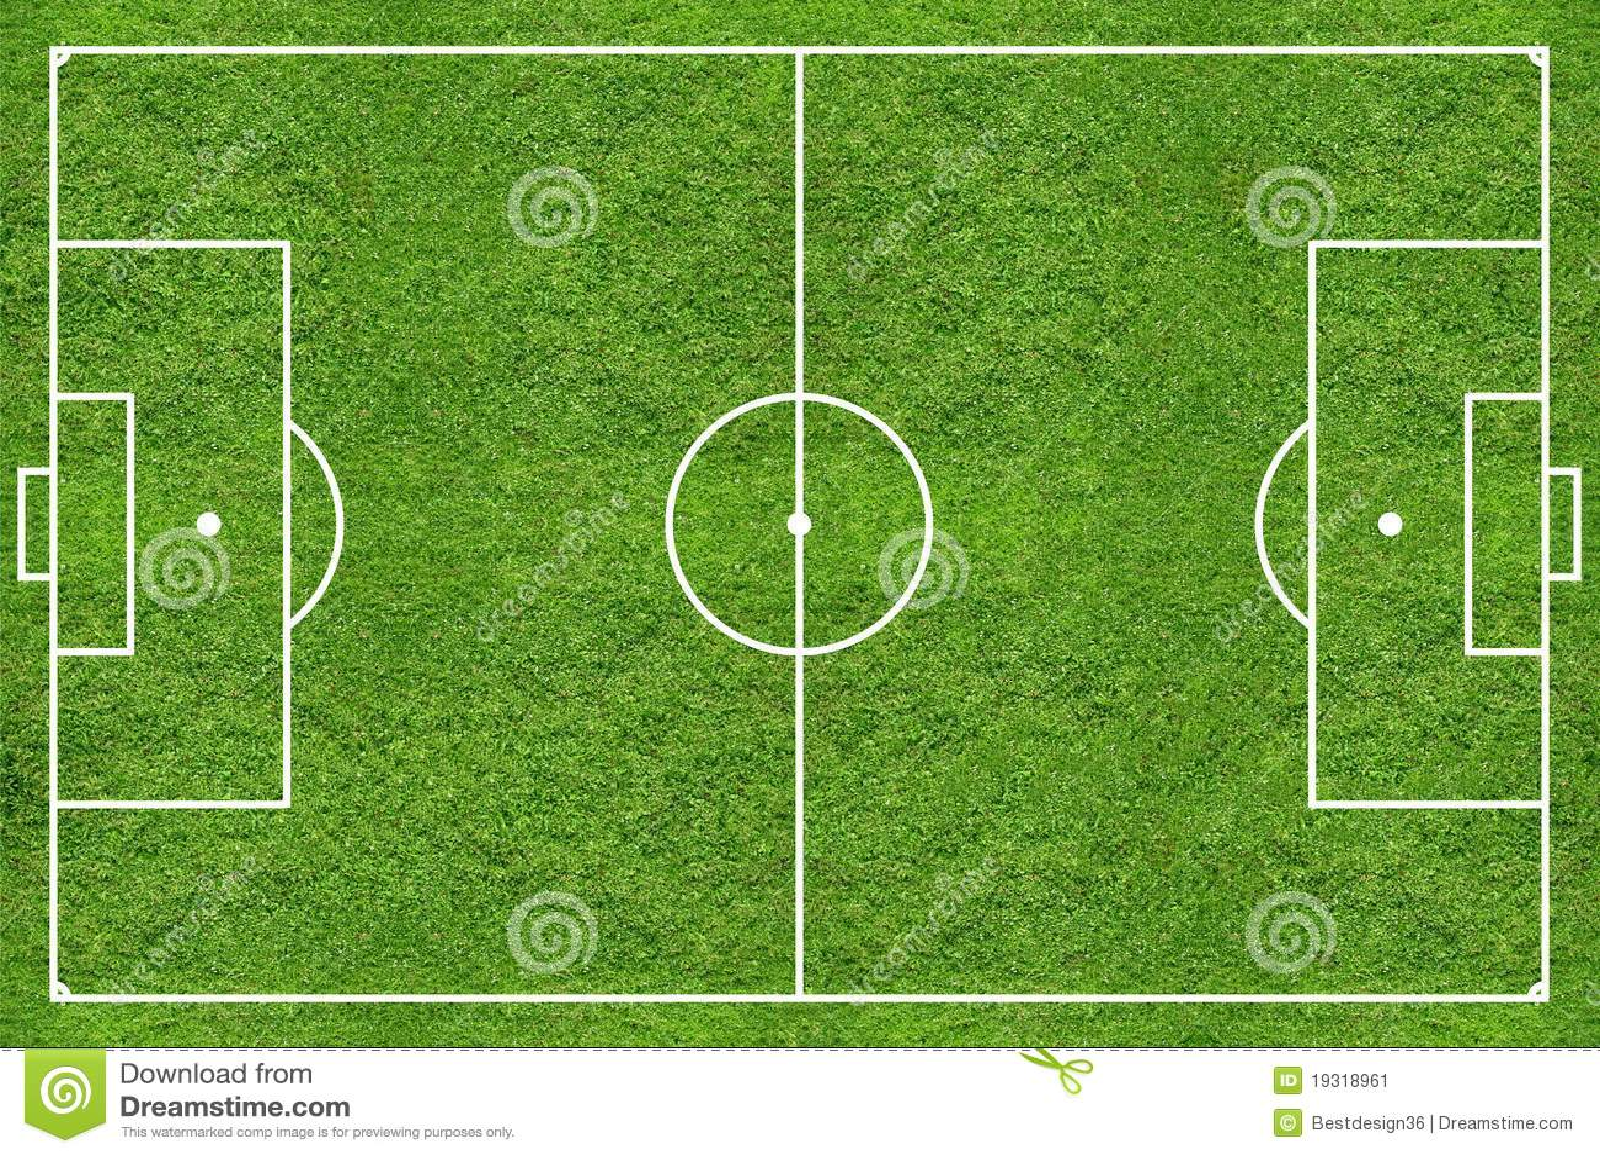 high resolution soccer grass field stock image